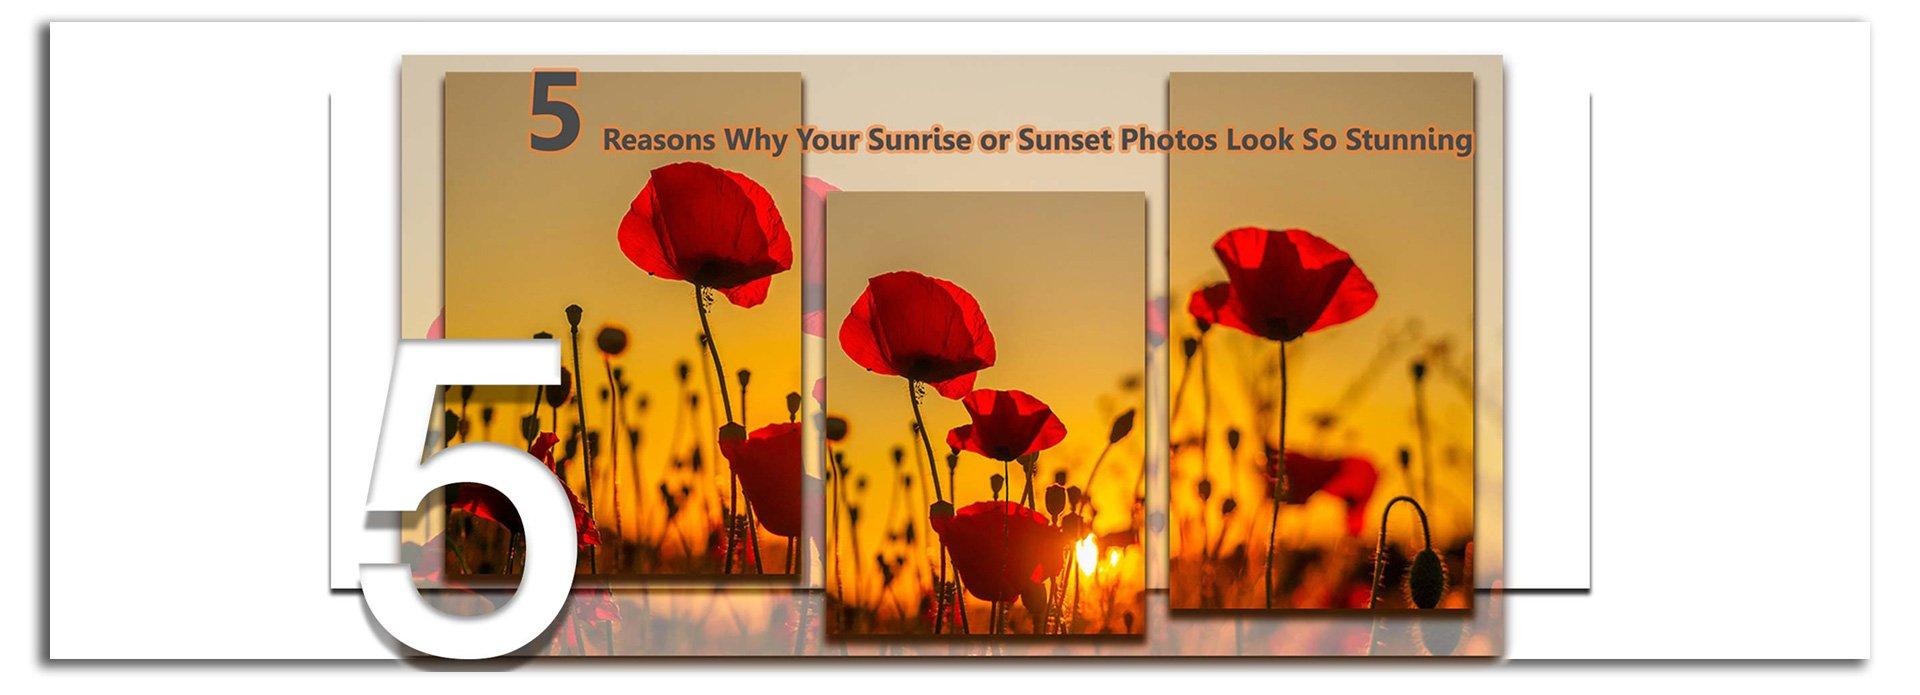 Sunrise or Sunset Photos  Stunning1 2 - عکاسی از طلوع و غروب و 5 دلیل برای عدم جذابیت عکس های شما